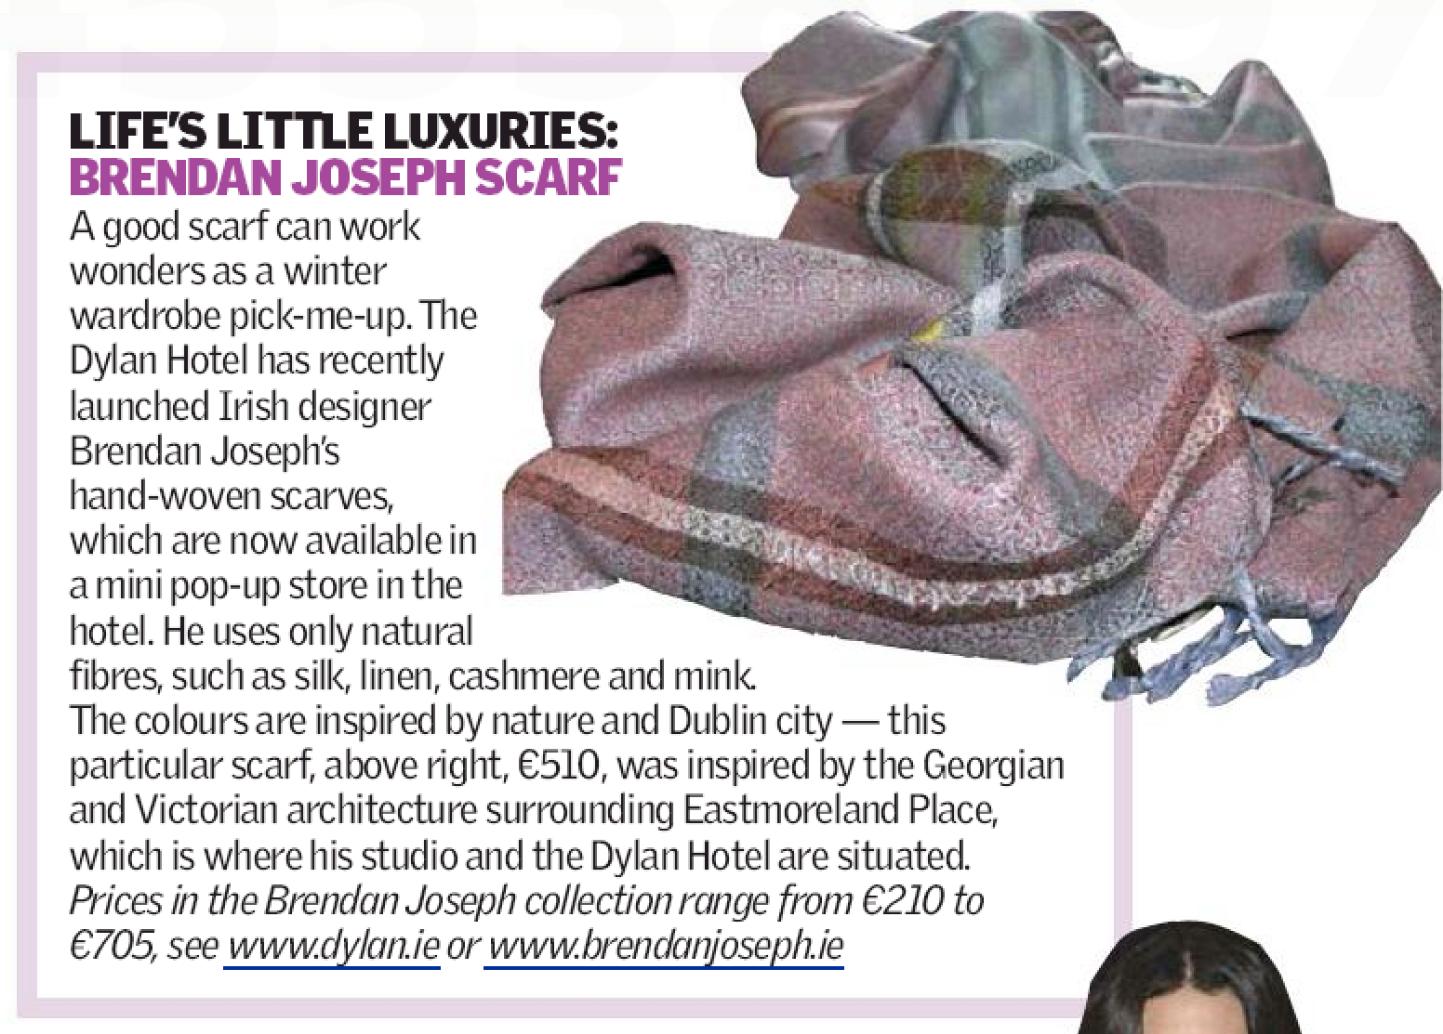 luxury-luxuries-scarf-sunday-independent-handwoven-georgian-inspiration